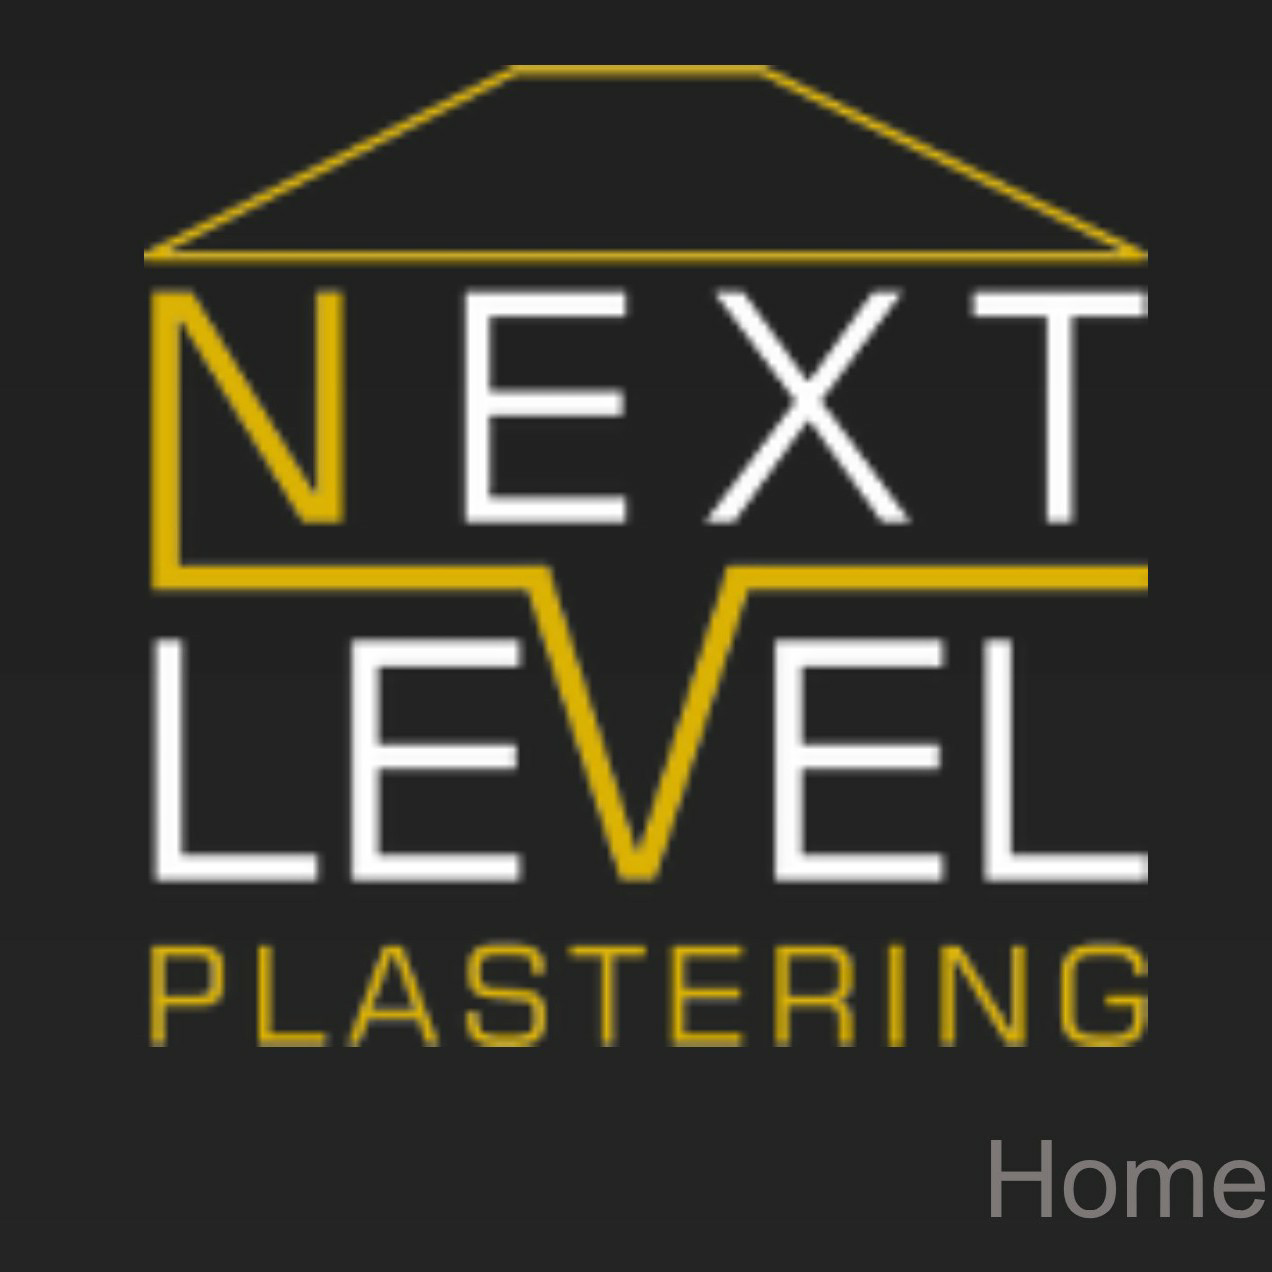 Next Level Plastering tradesman profile